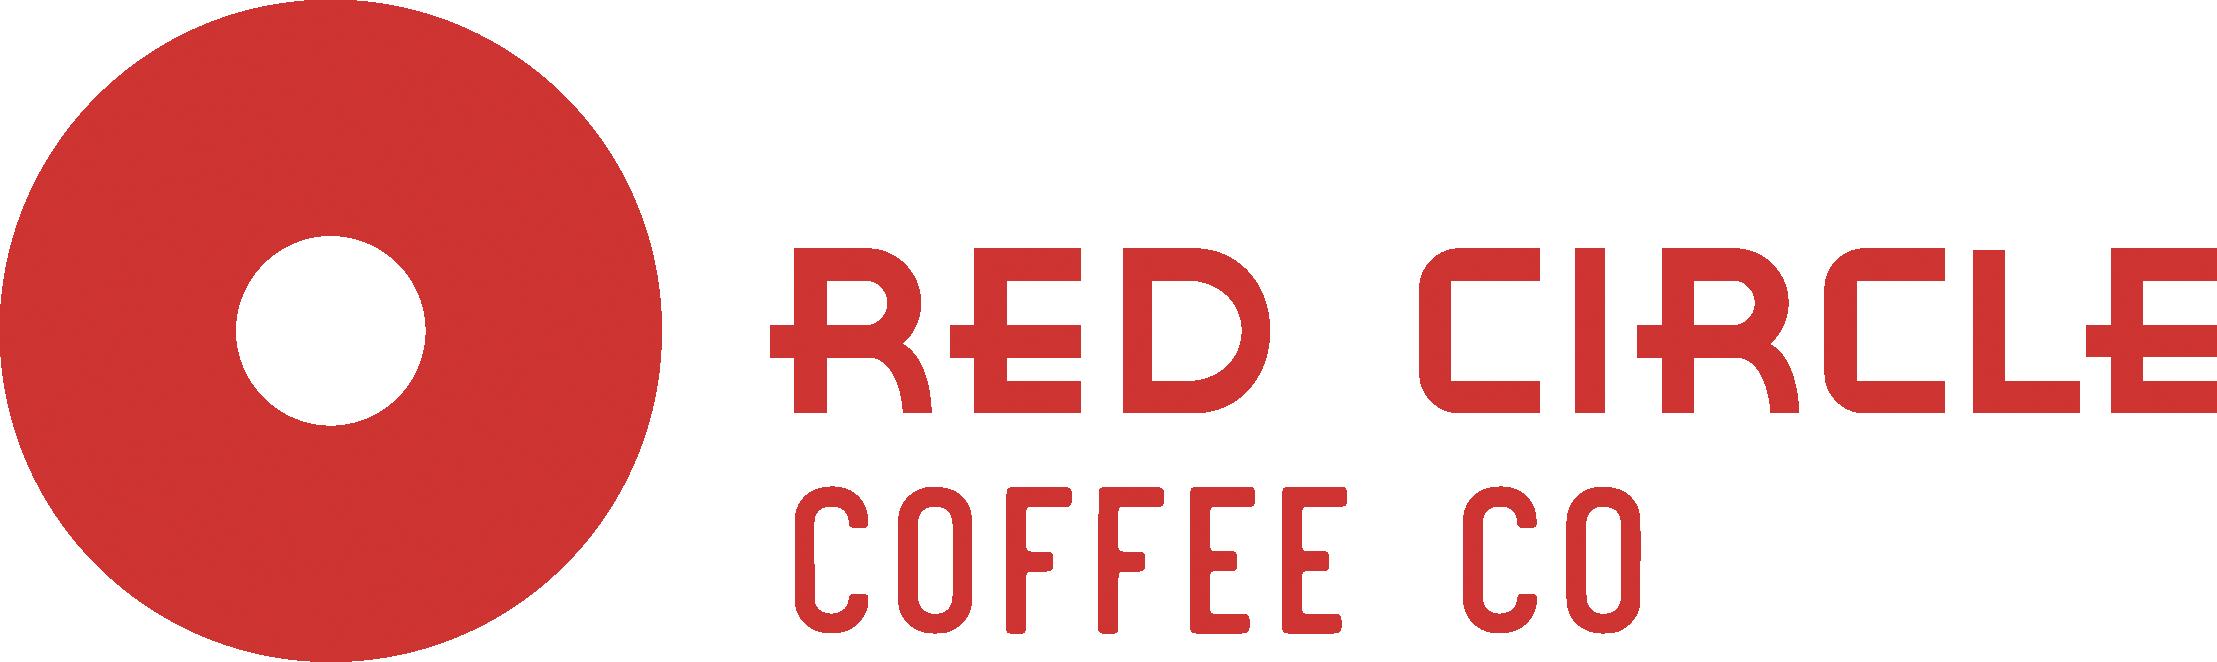 Red Circle Coffee Co. Logo